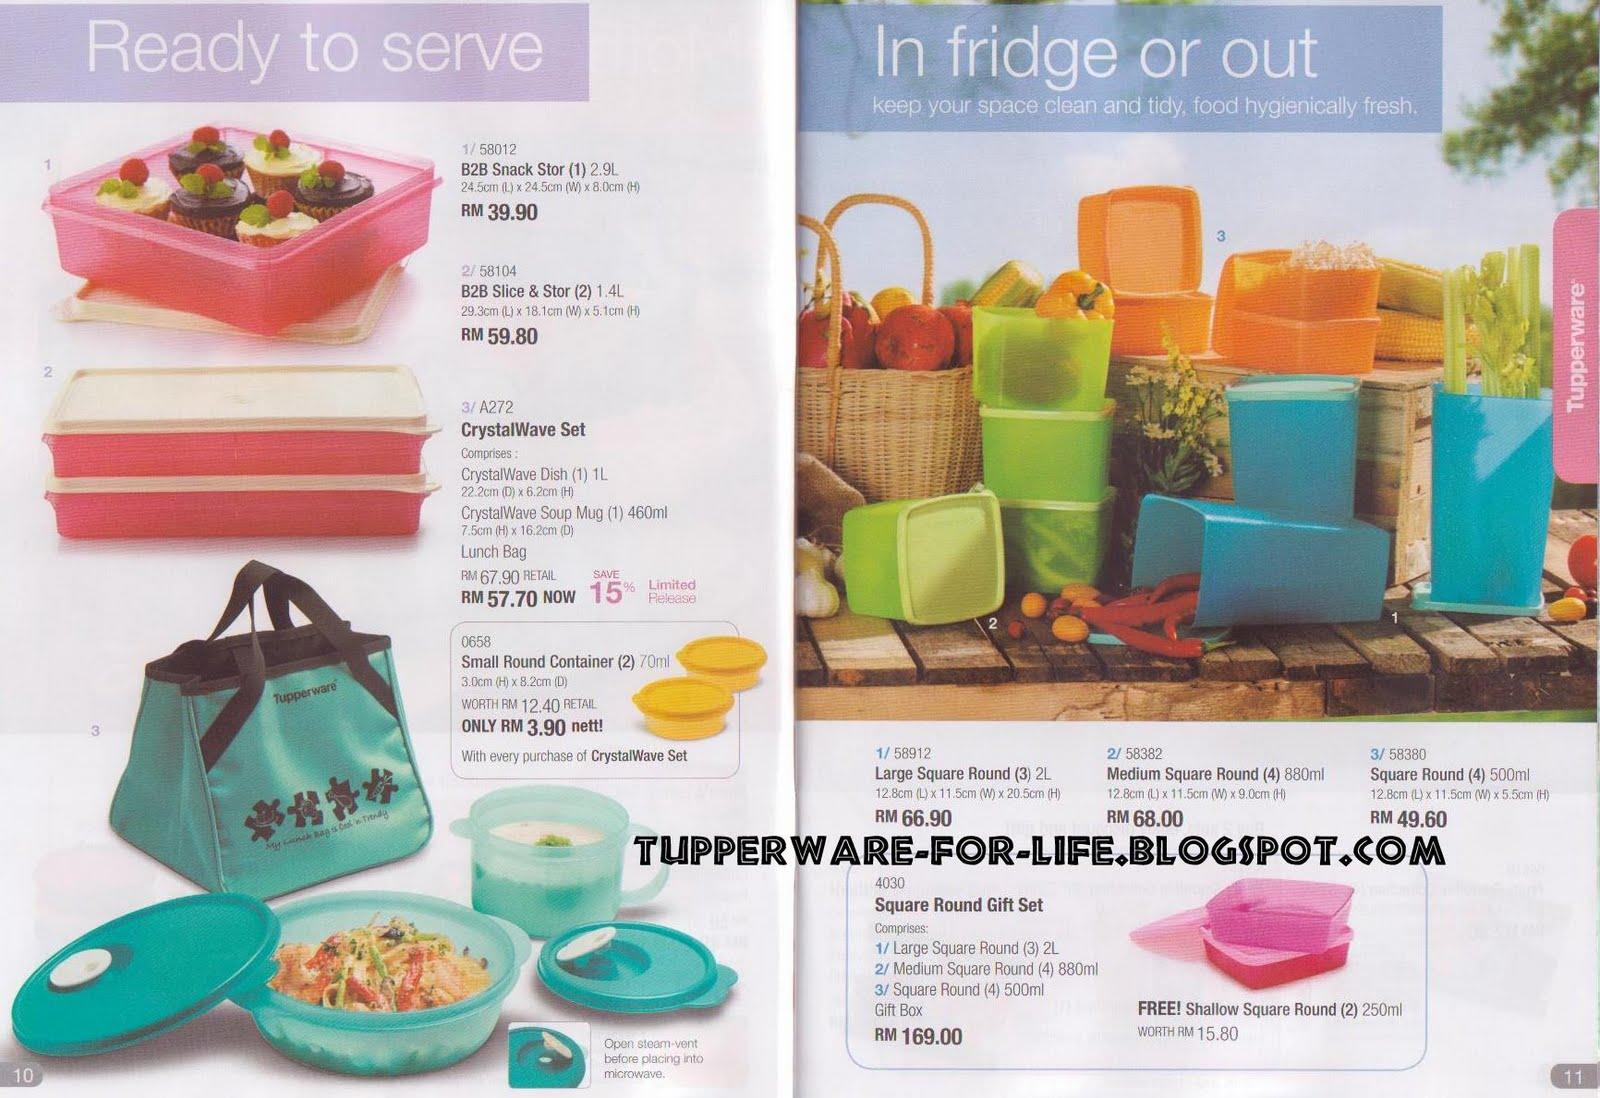 how to buy tupperware online